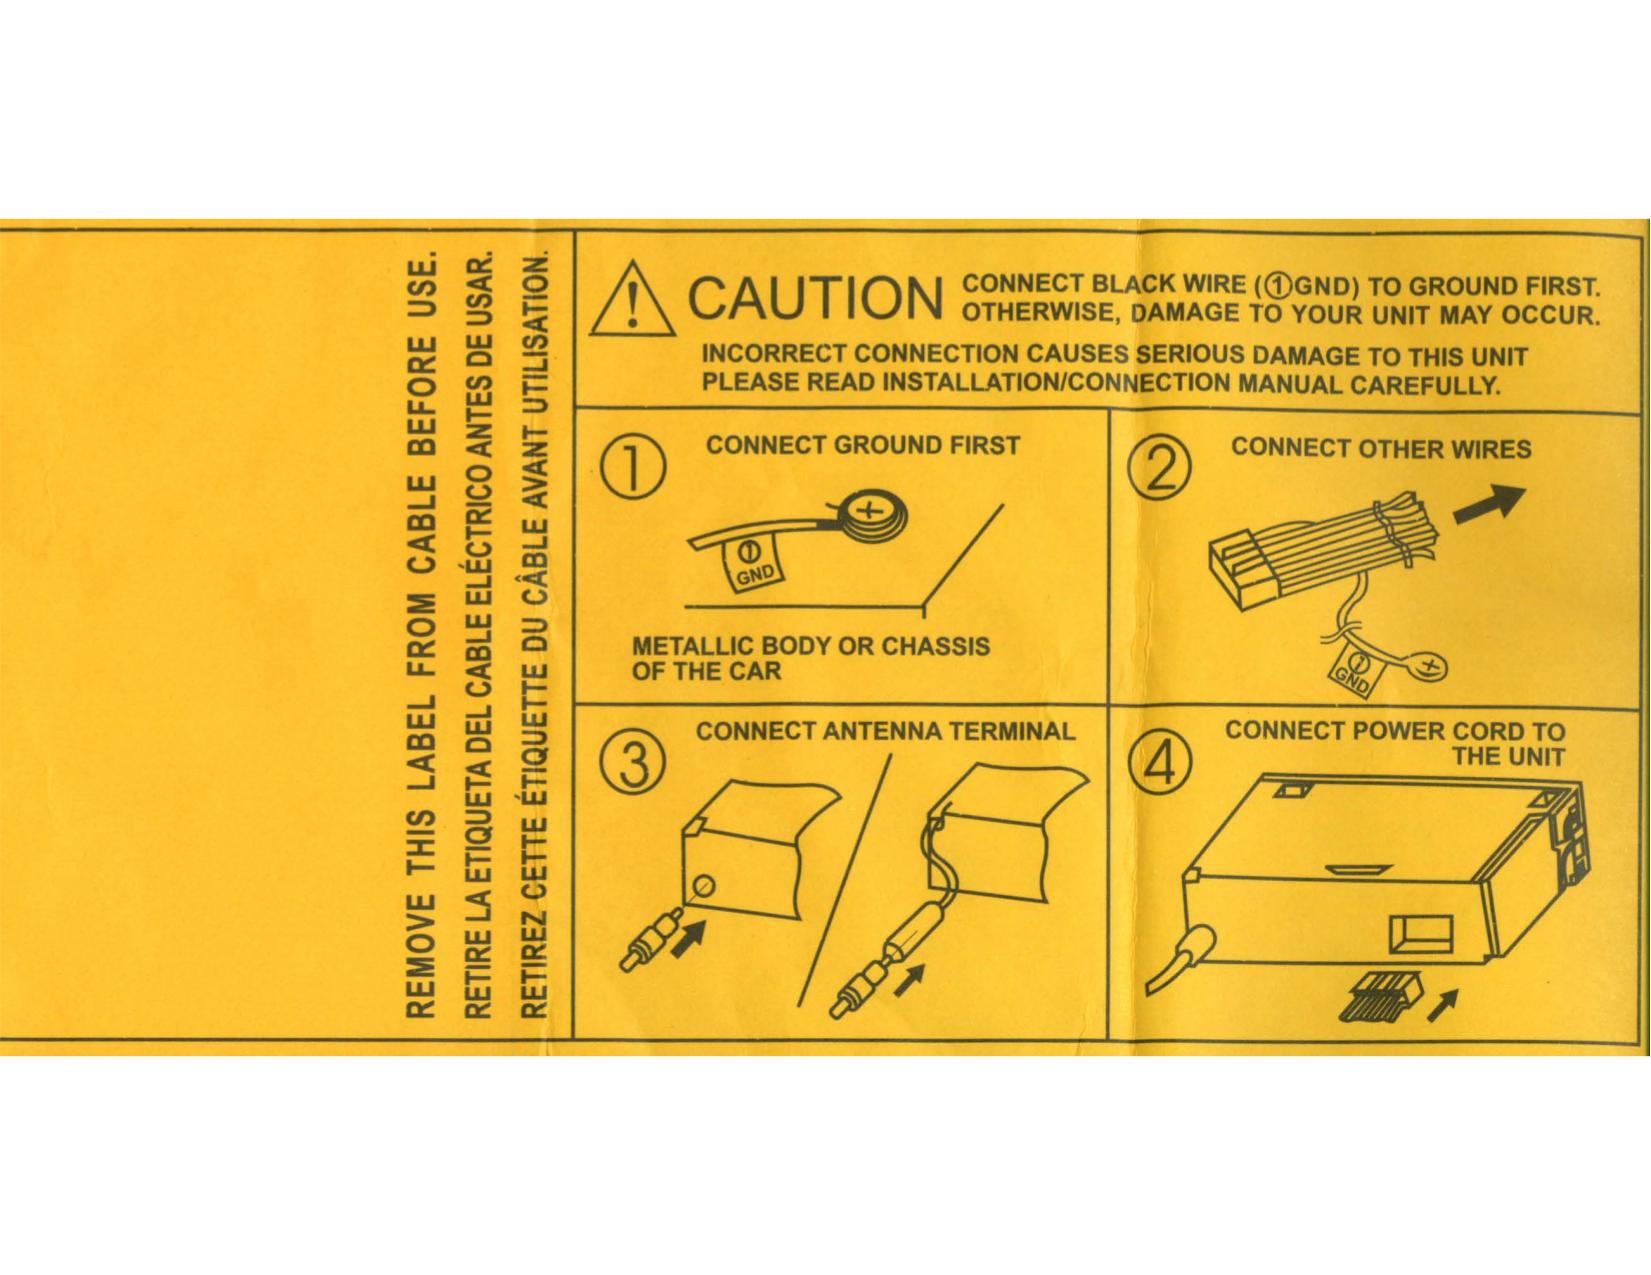 PDF manual for JVC Car Receiver KD-R200 on jvc kd r200 installation, jvc kd r200 clock, jvc kd r300 wiring-diagram, jvc cd player wiring-diagram, jvc kd r200 bluetooth, jvc kd g220 wiring-diagram,